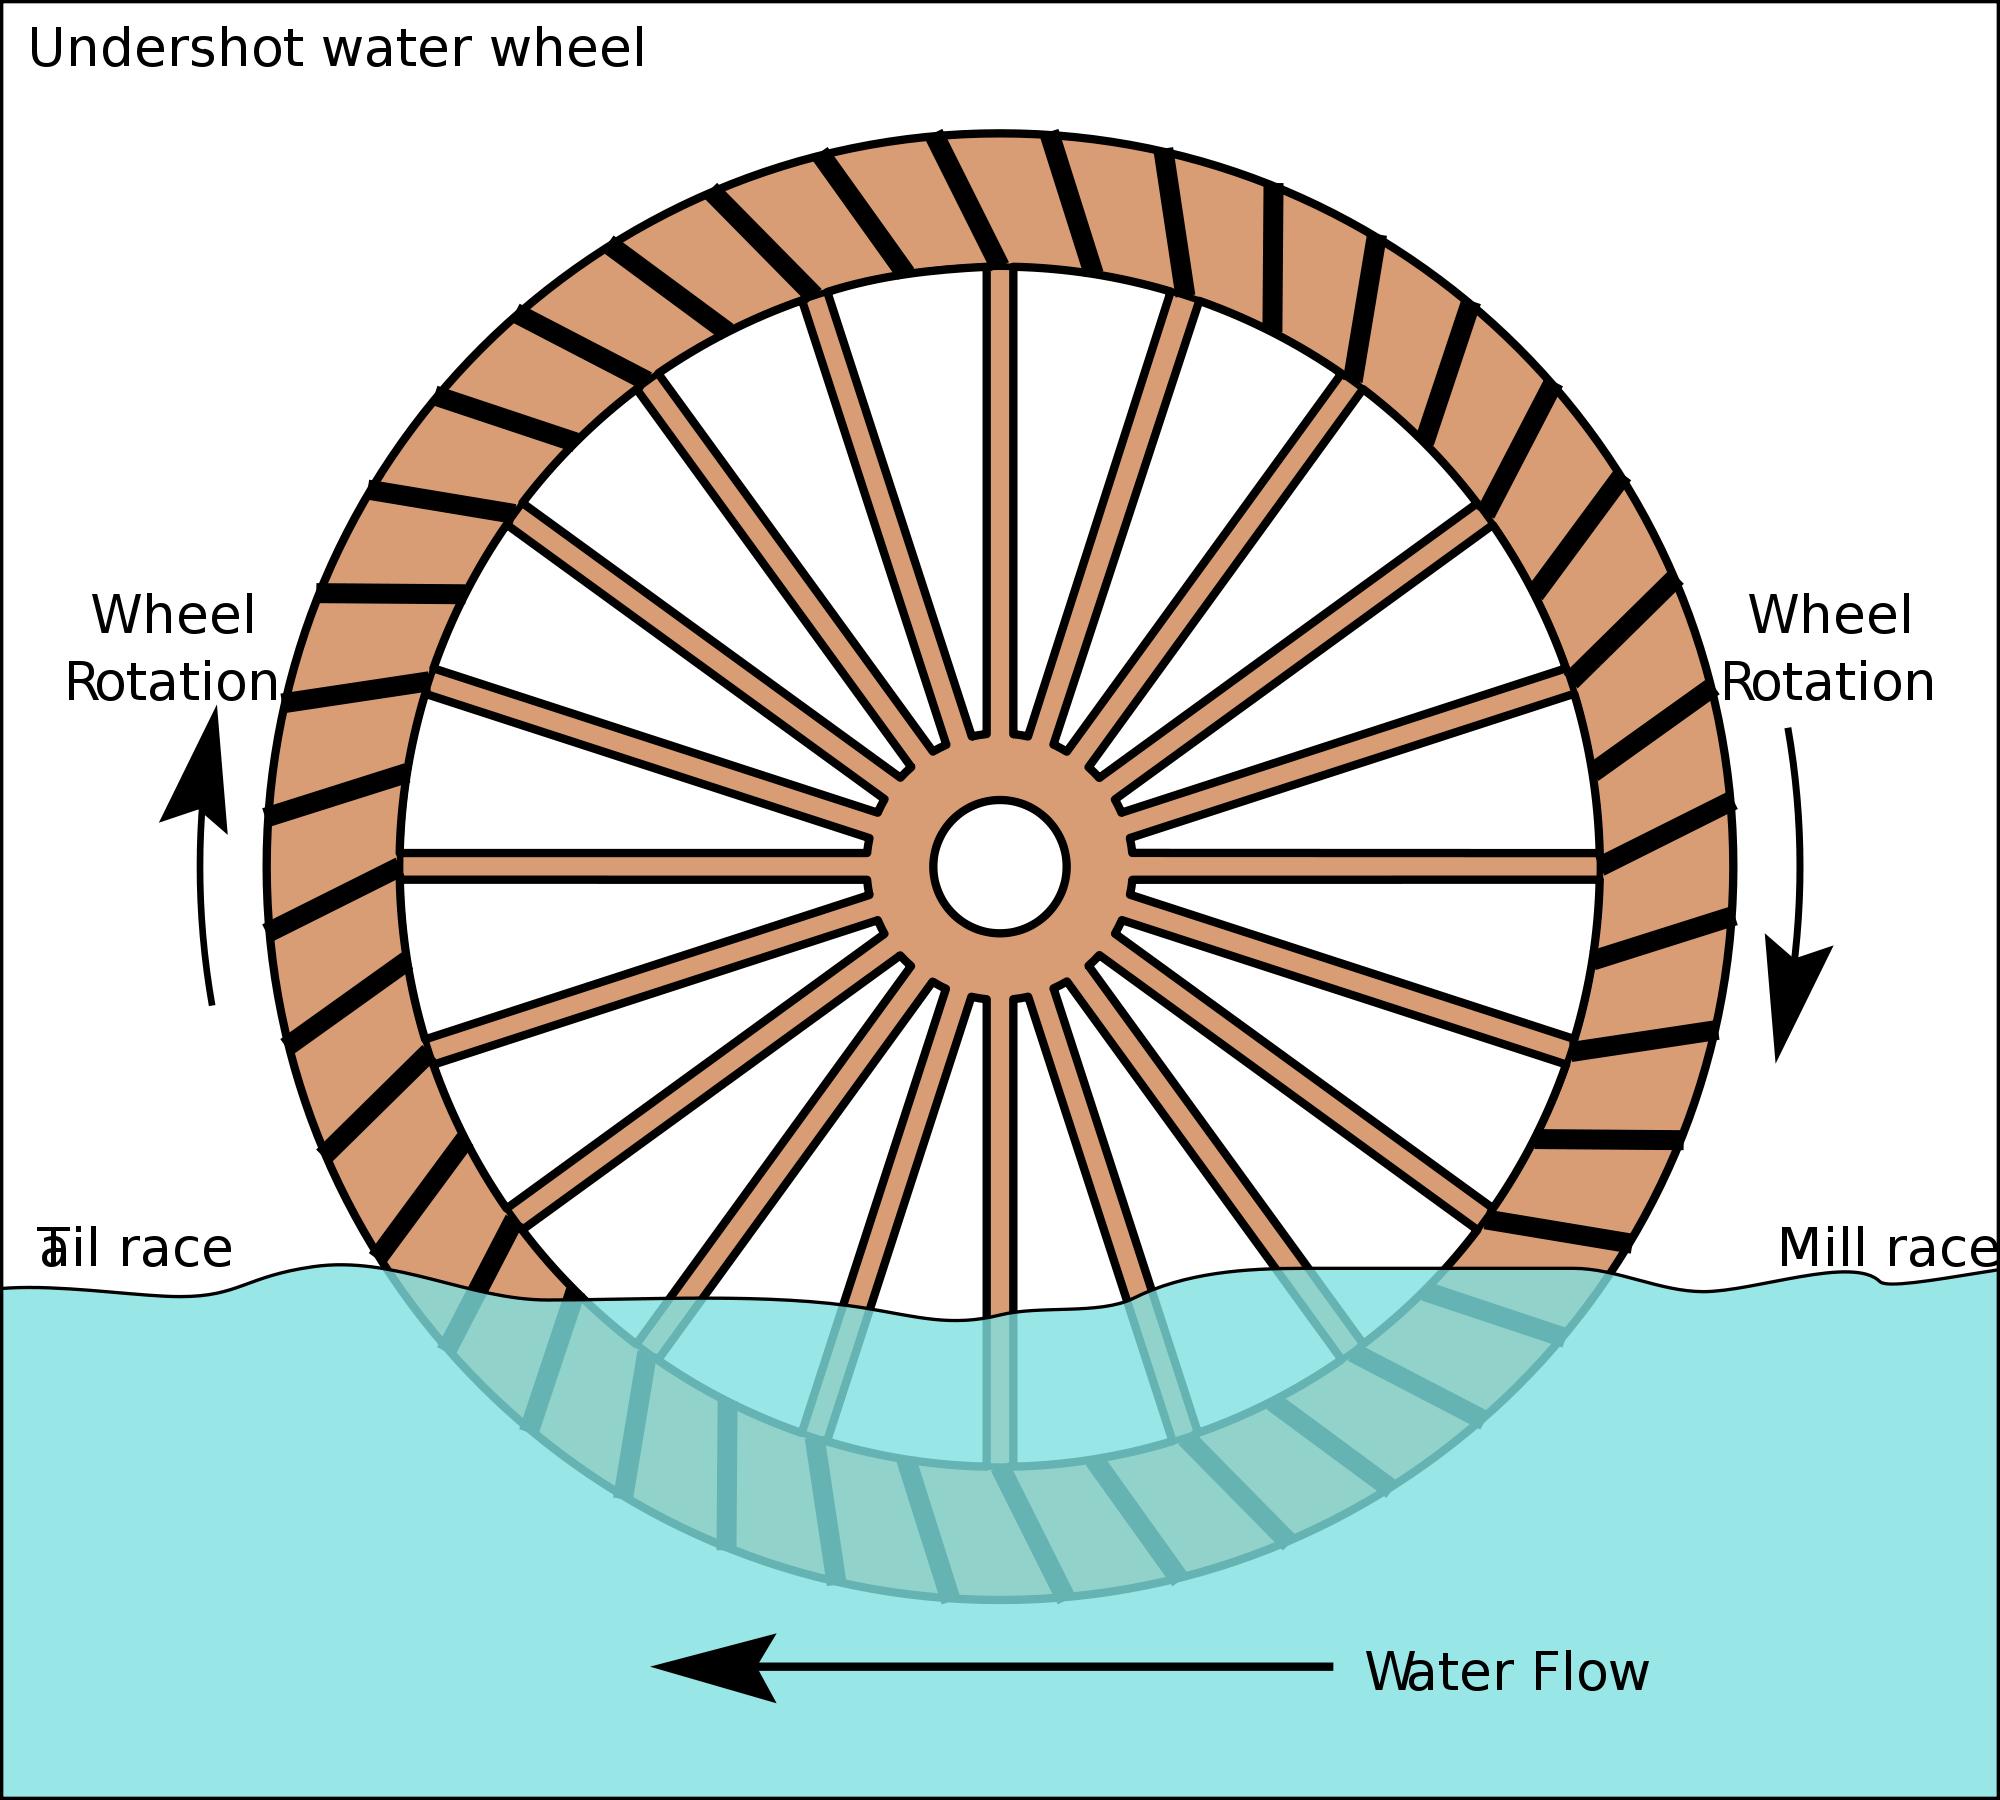 Undershot water wheel schematic